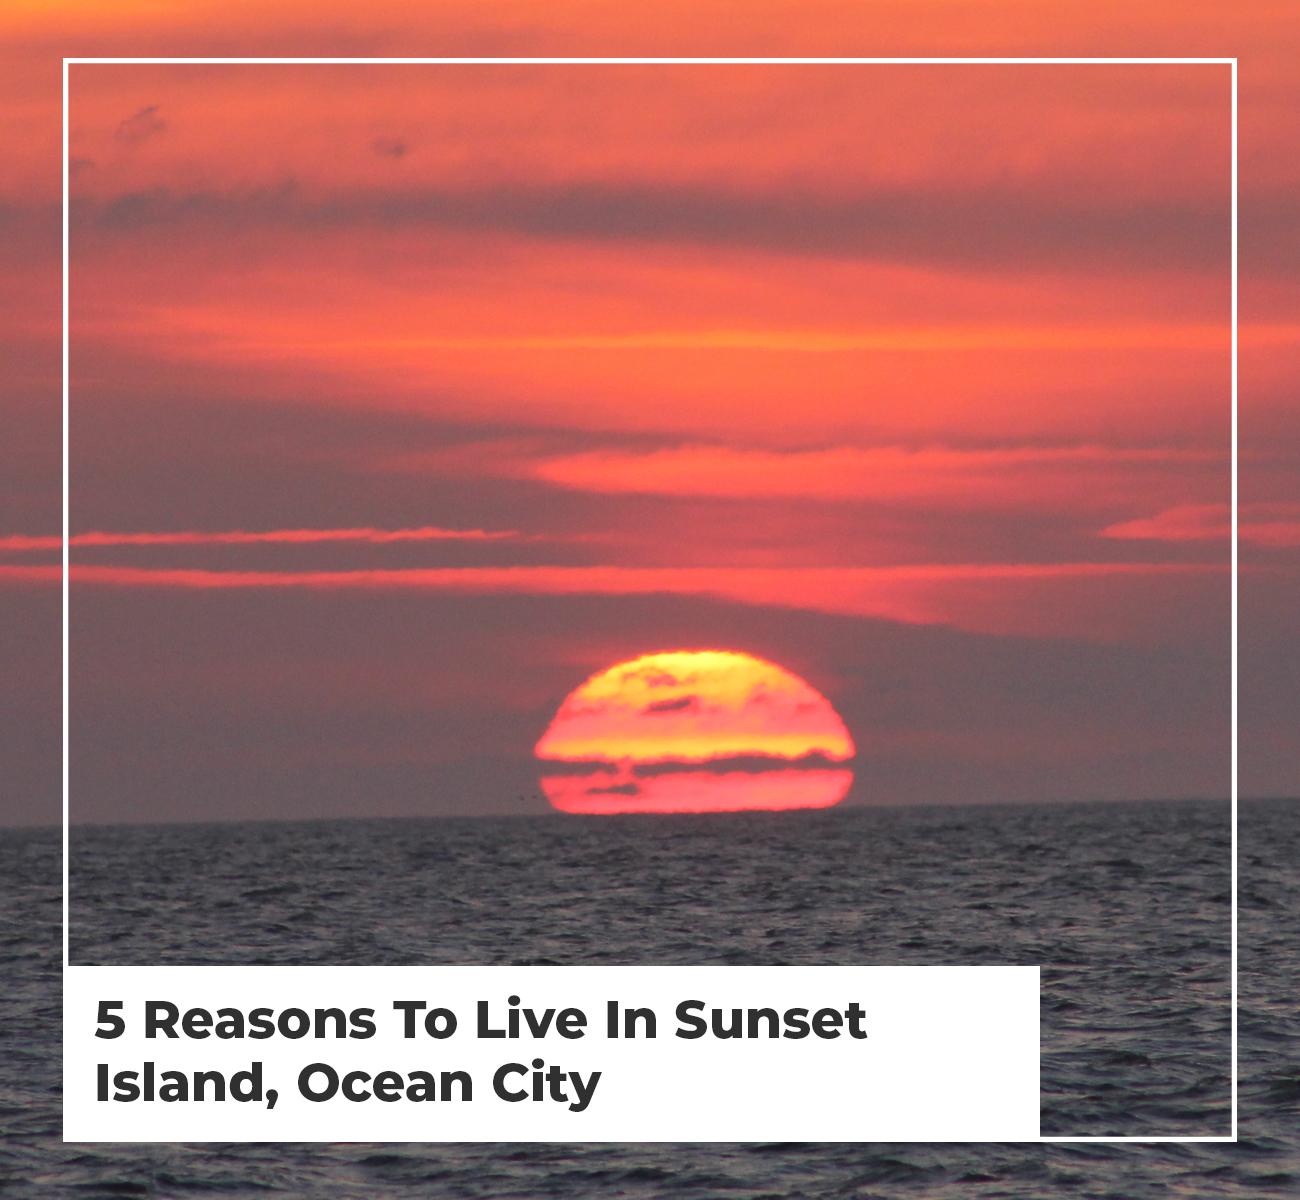 Living in Sunset Island Ocean City